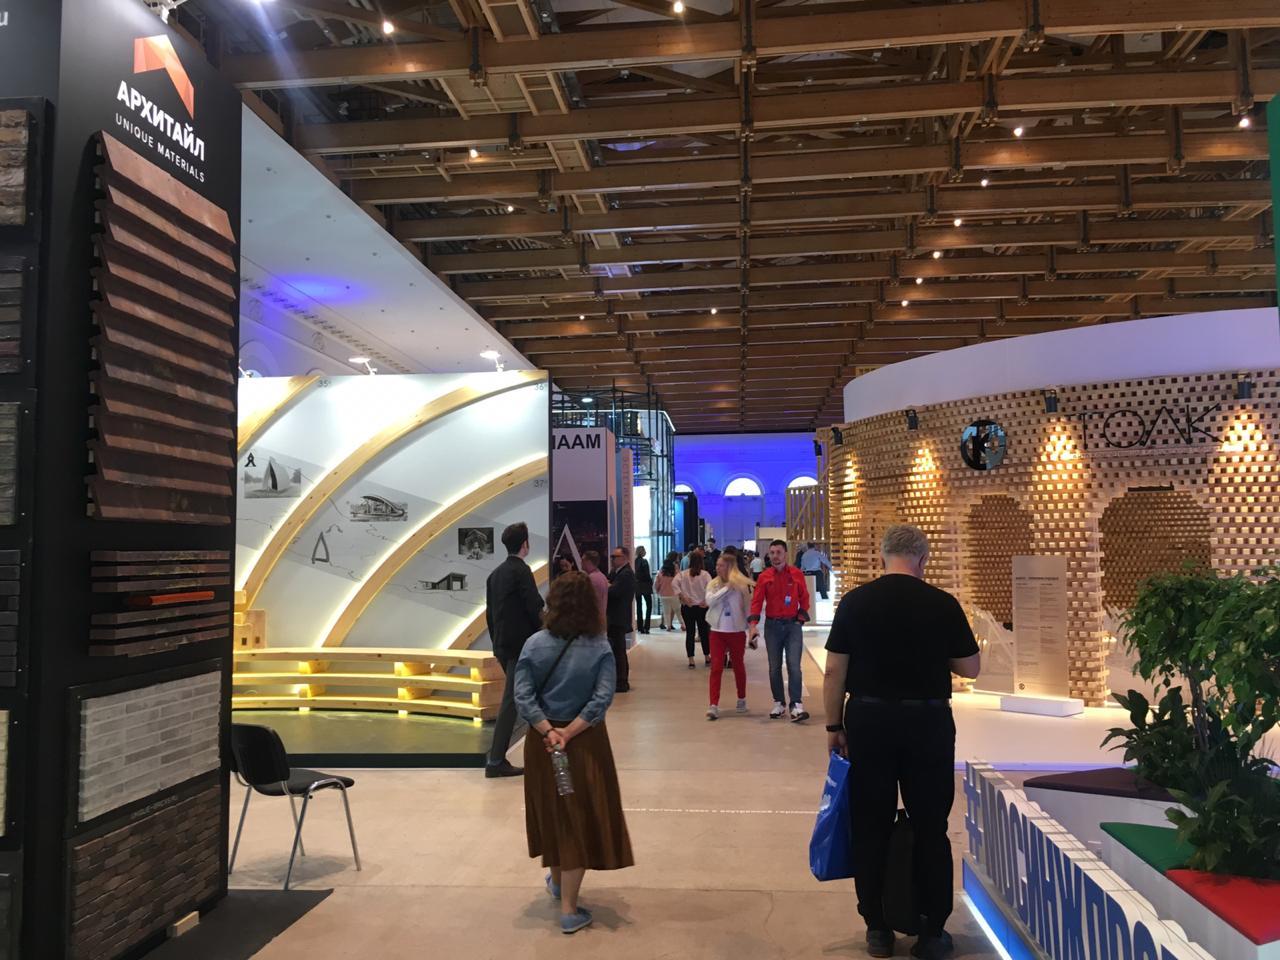 Международная выставка «АРХ МОСКВА» открылась в «Манеже»